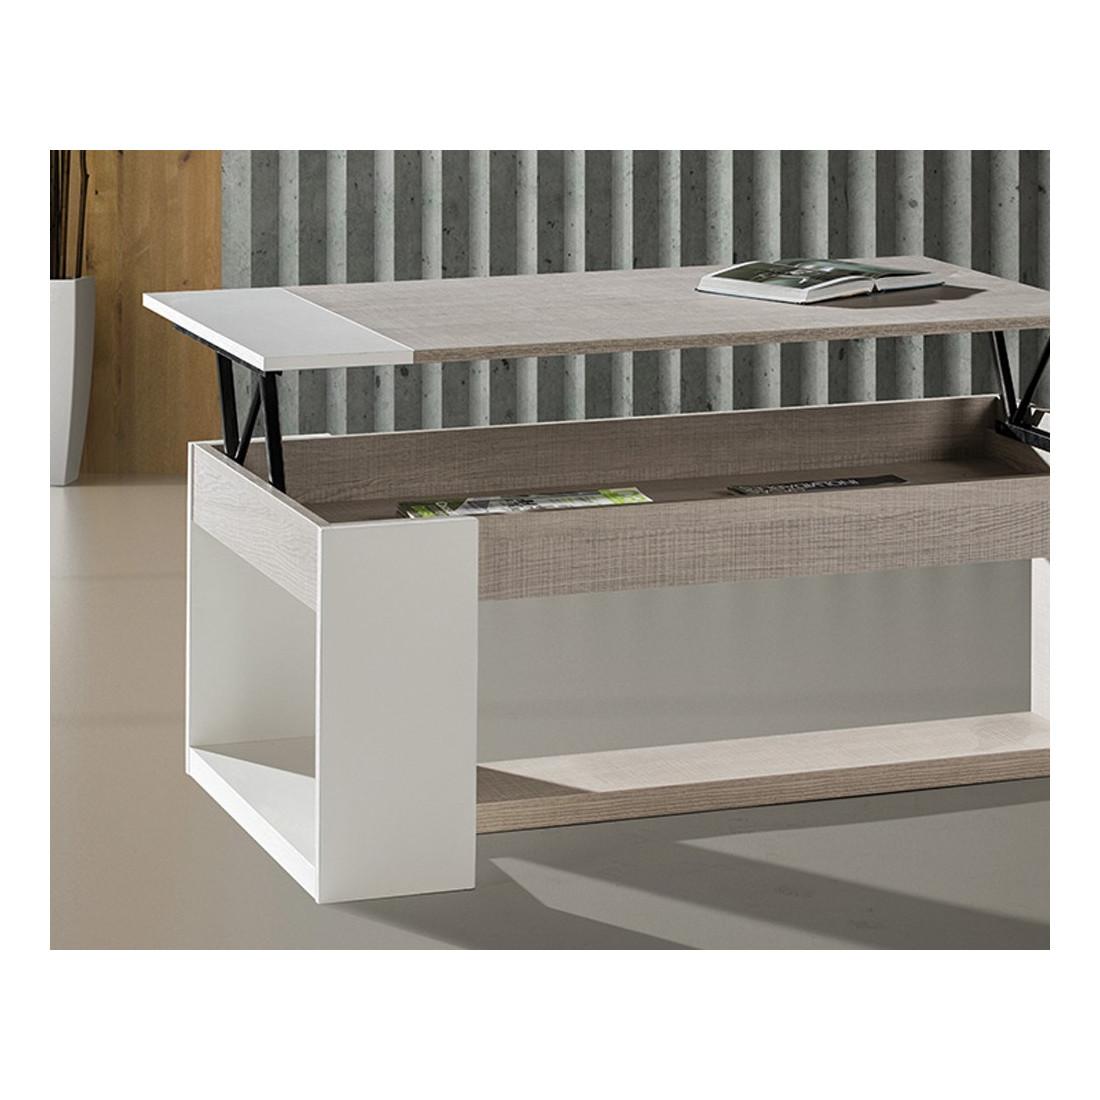 Table Basse Relevable Moderne Chêne Clair Esteban Univers Salon